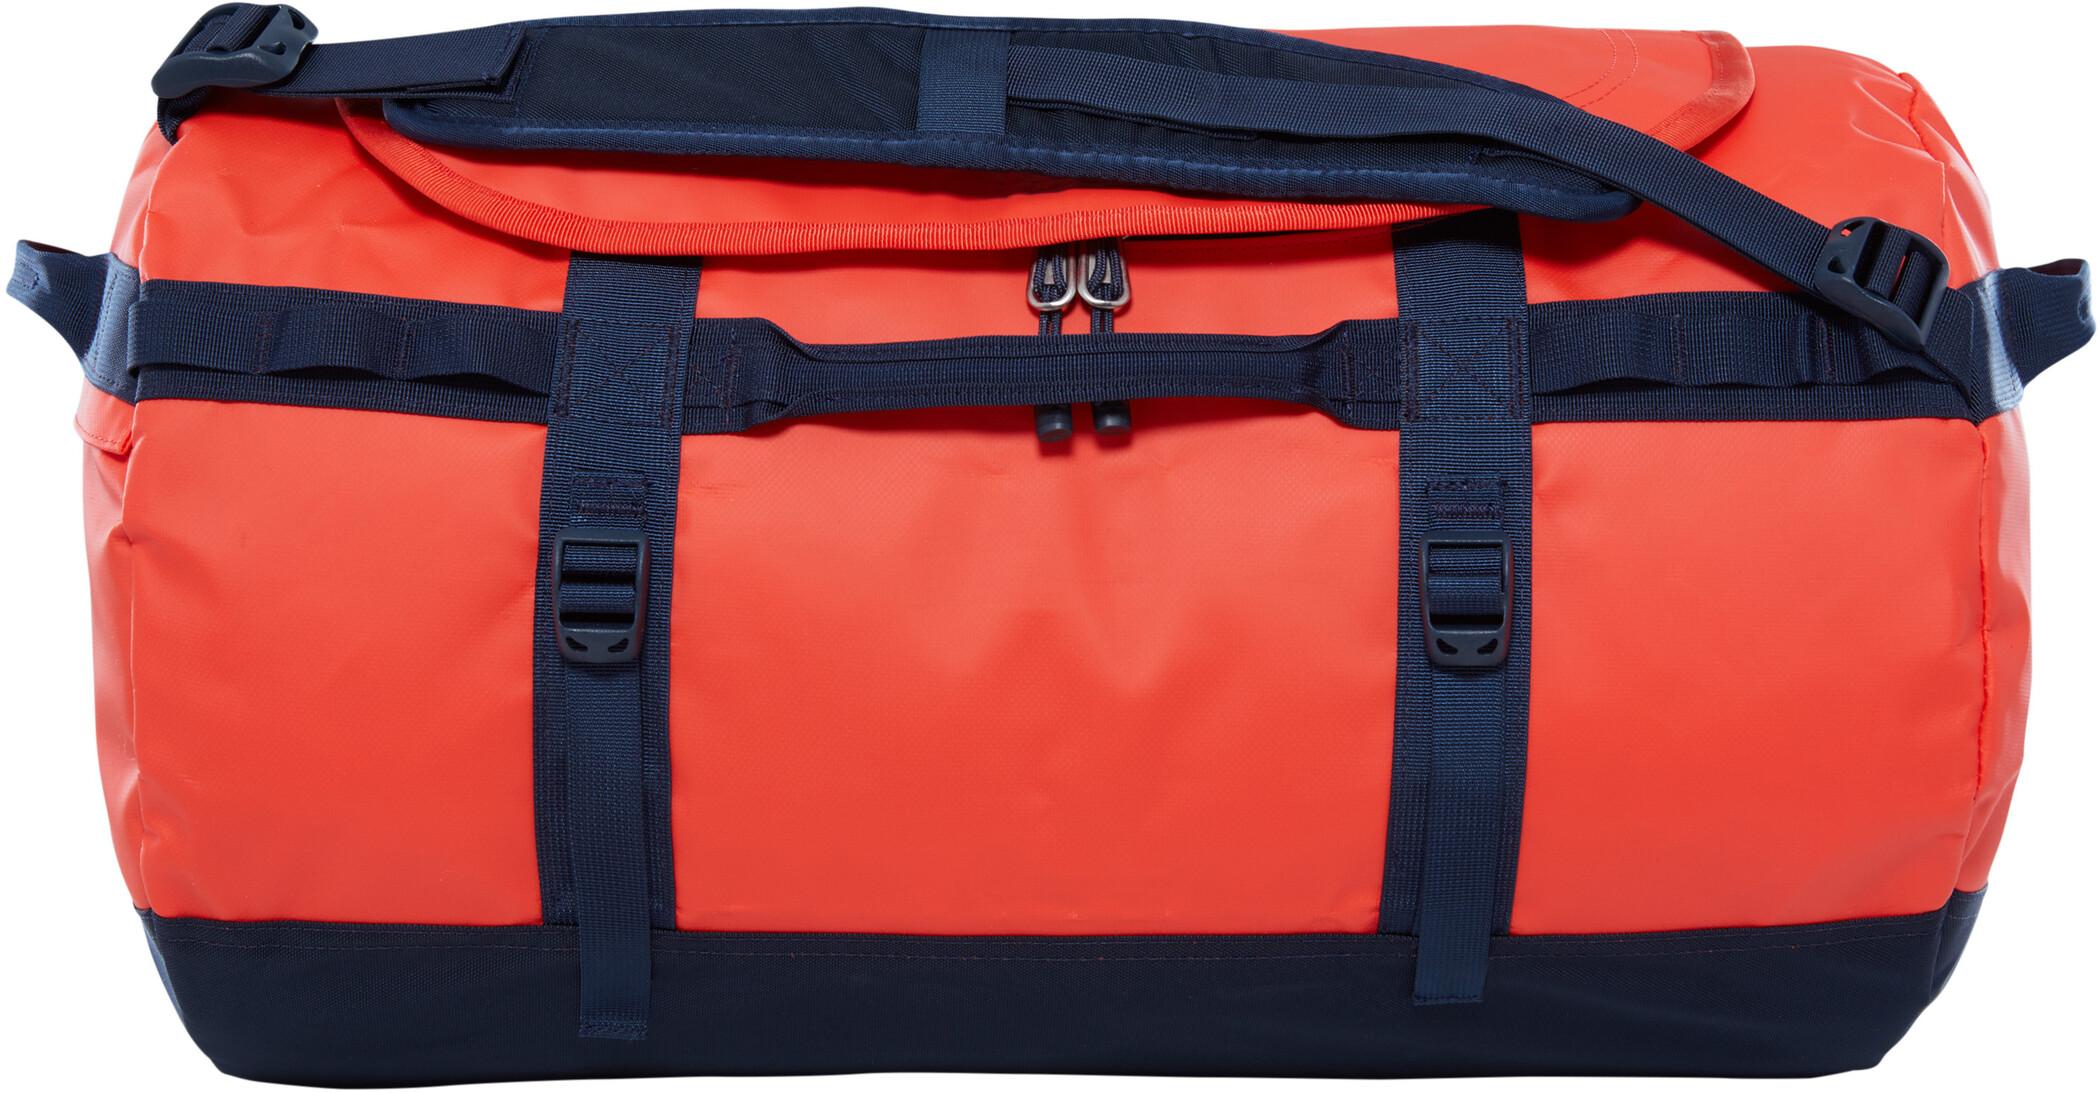 Travel Bags Single Lion Moon Starry Night Portable Duffel Vintage Trolley Handle Luggage Bag